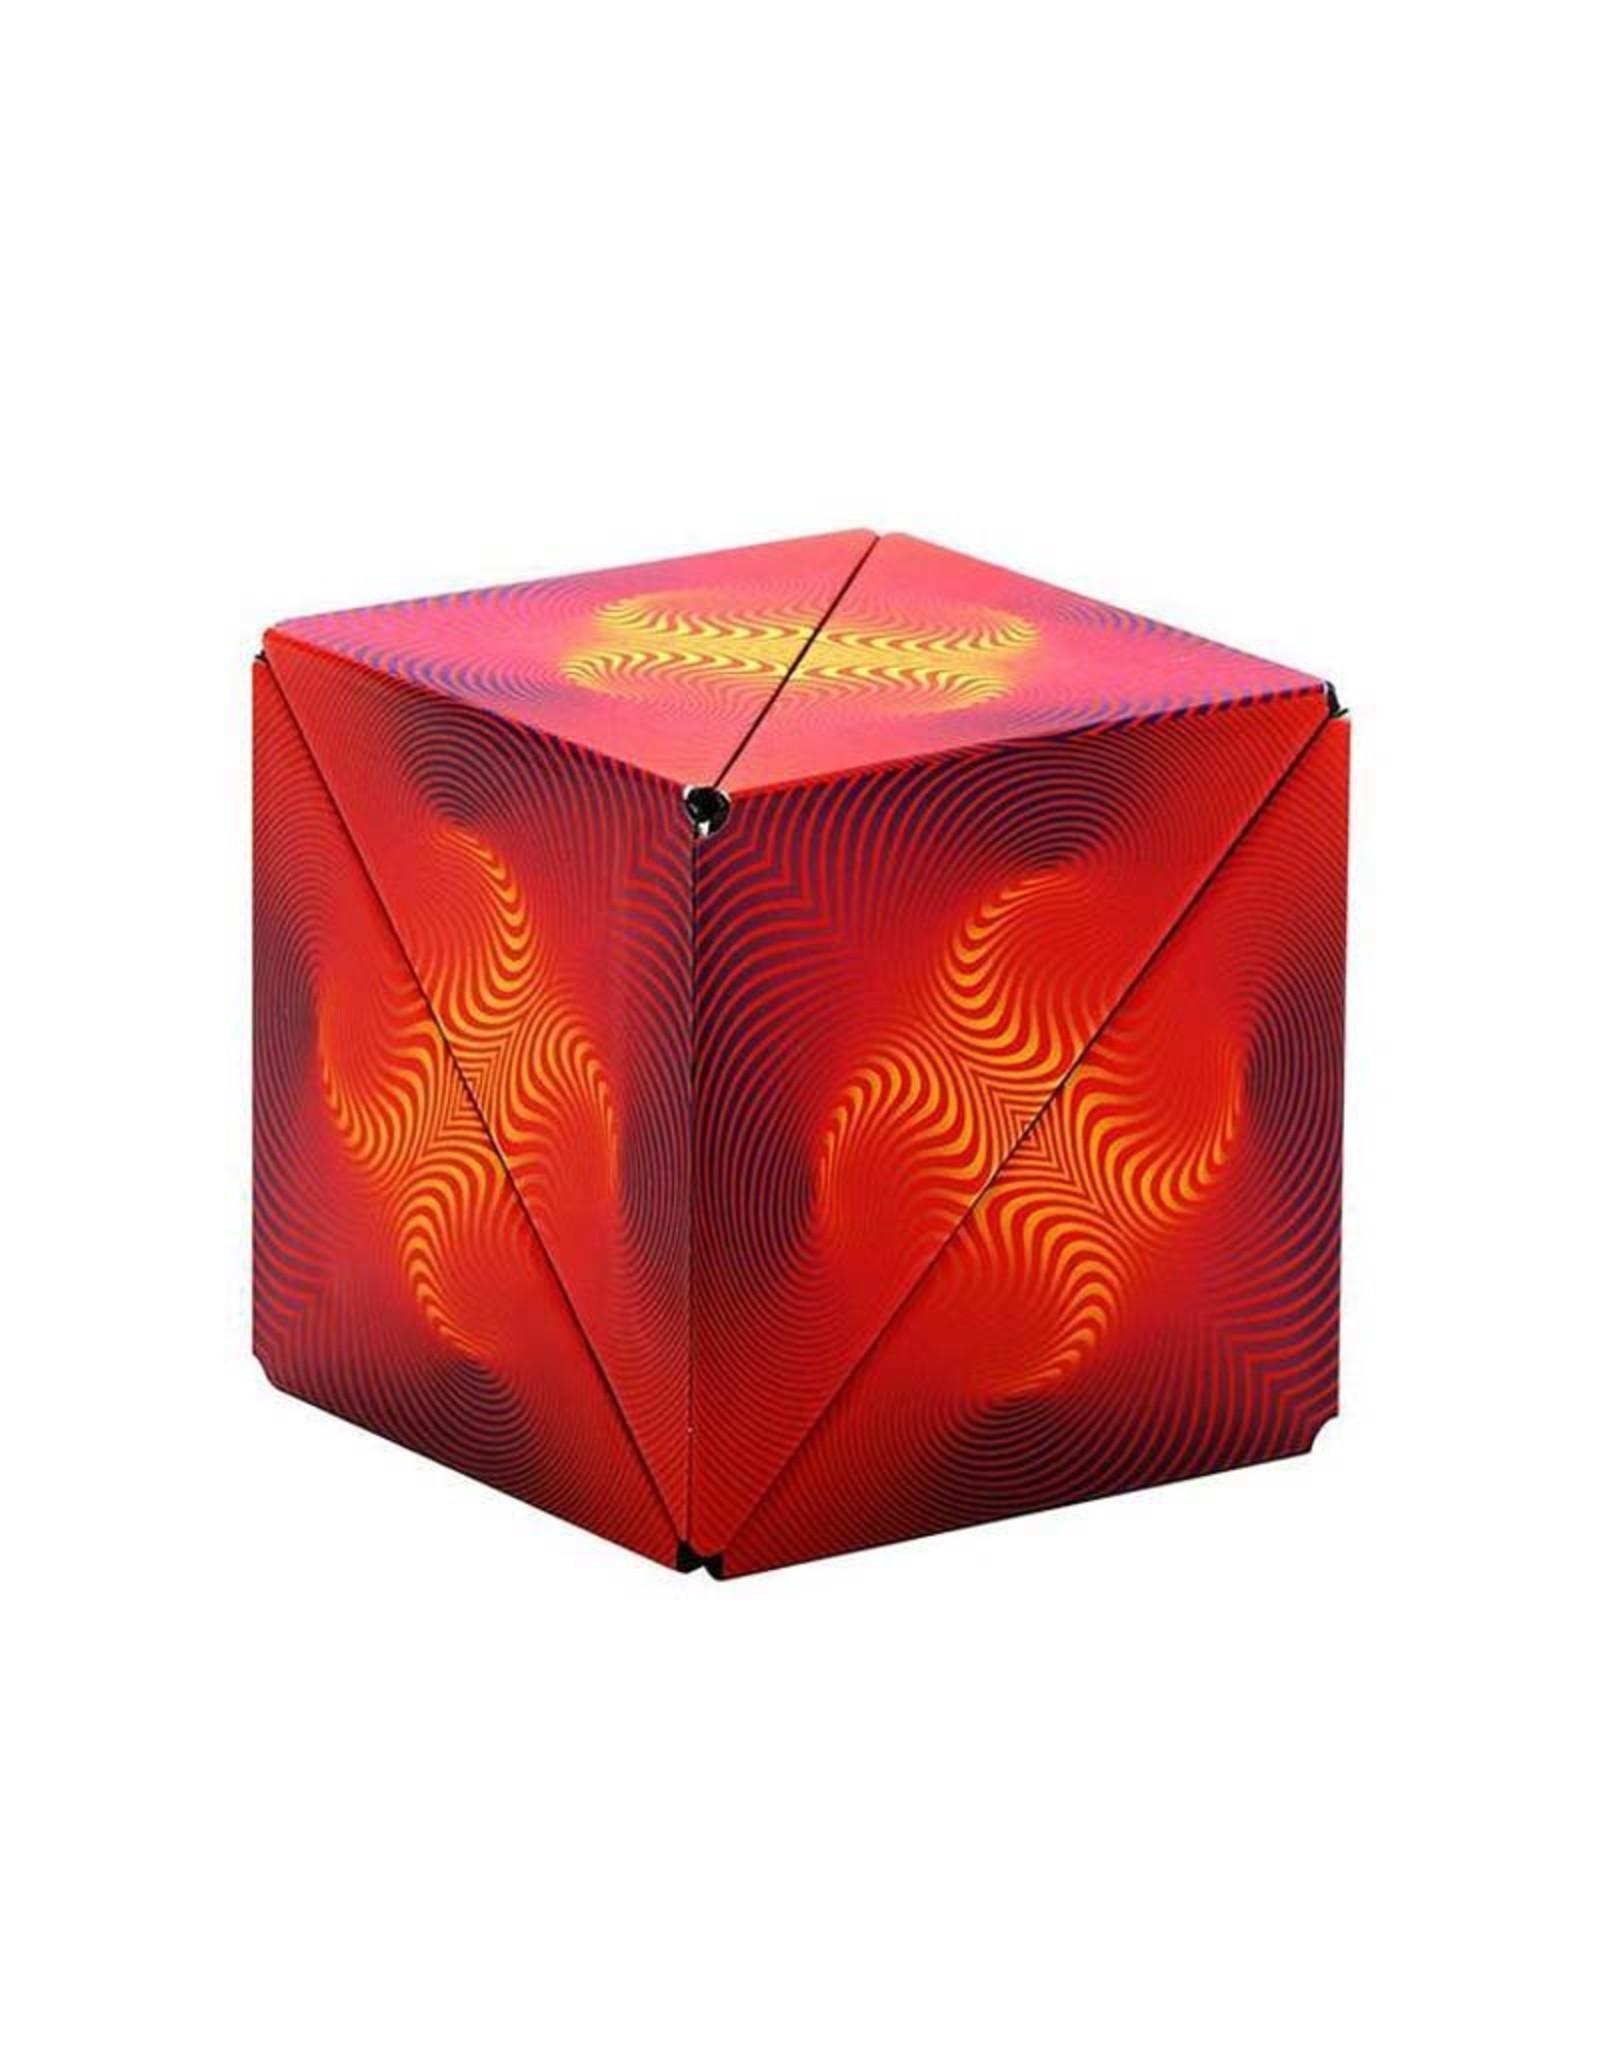 Fun In Motion Shashibo Cube Optical Illusion